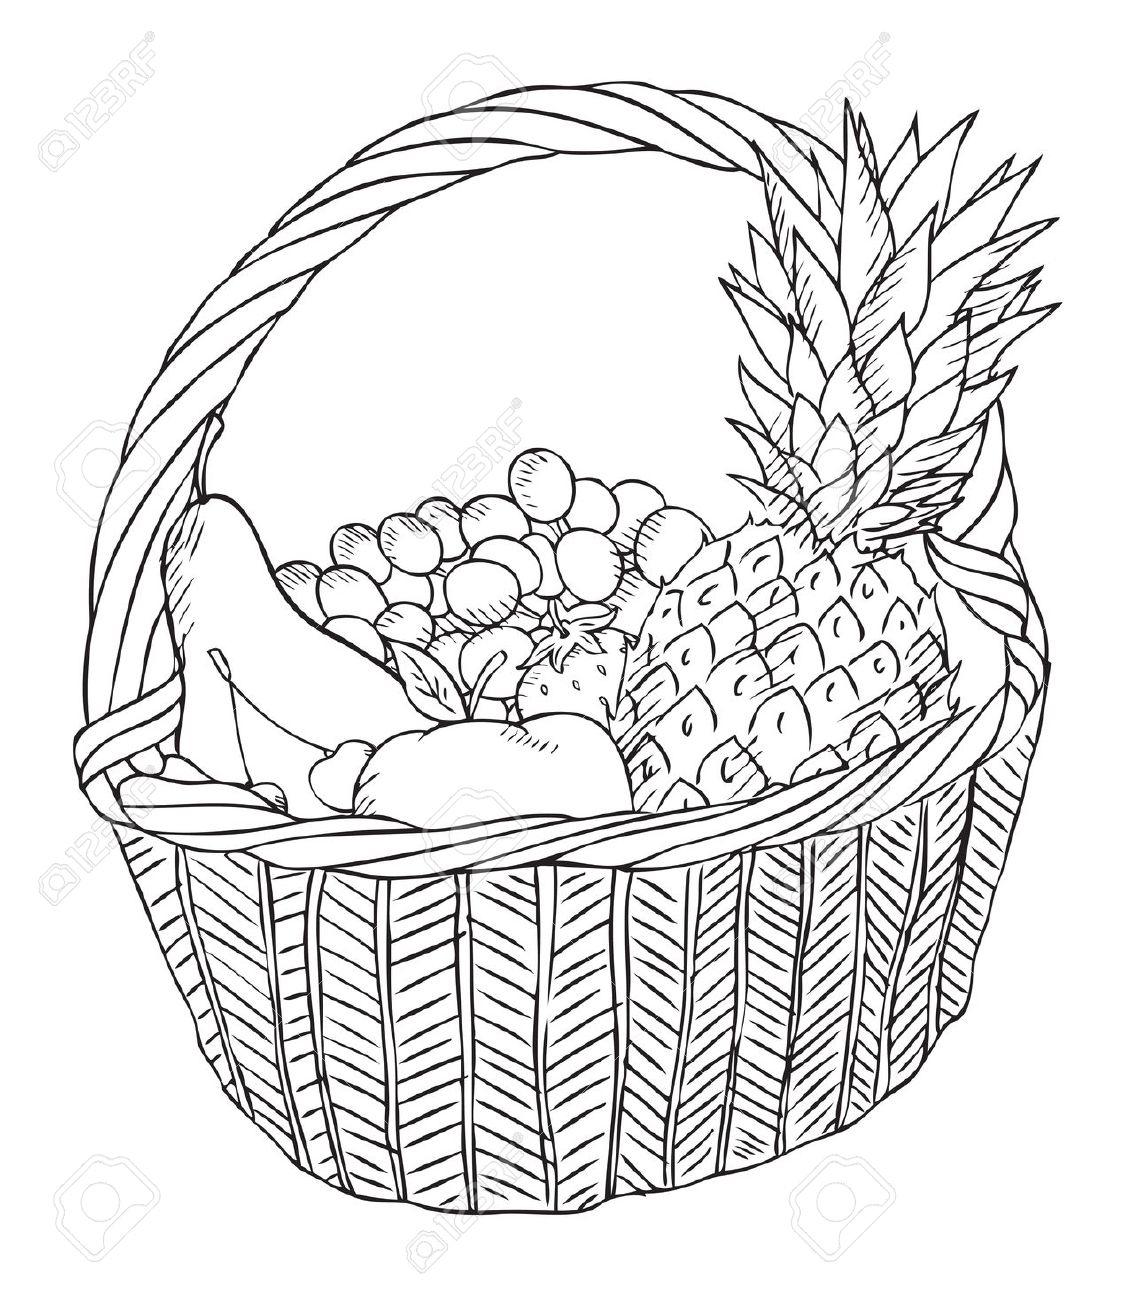 Fruit Basket Drawing Step By Step At GetDrawings.com